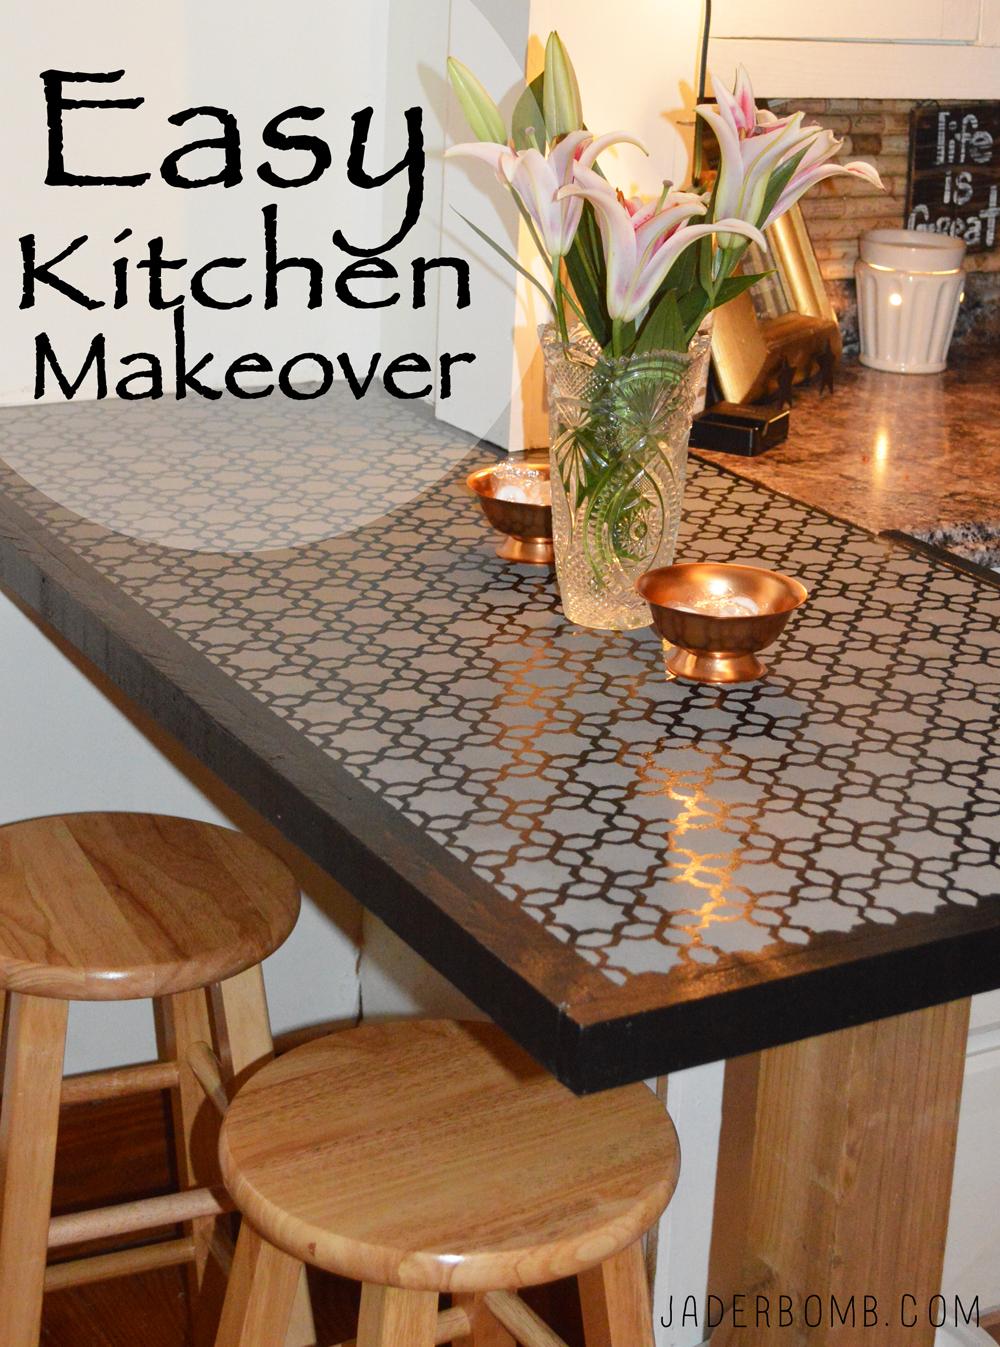 Easy Kitchen Makeover - Jaderbomb